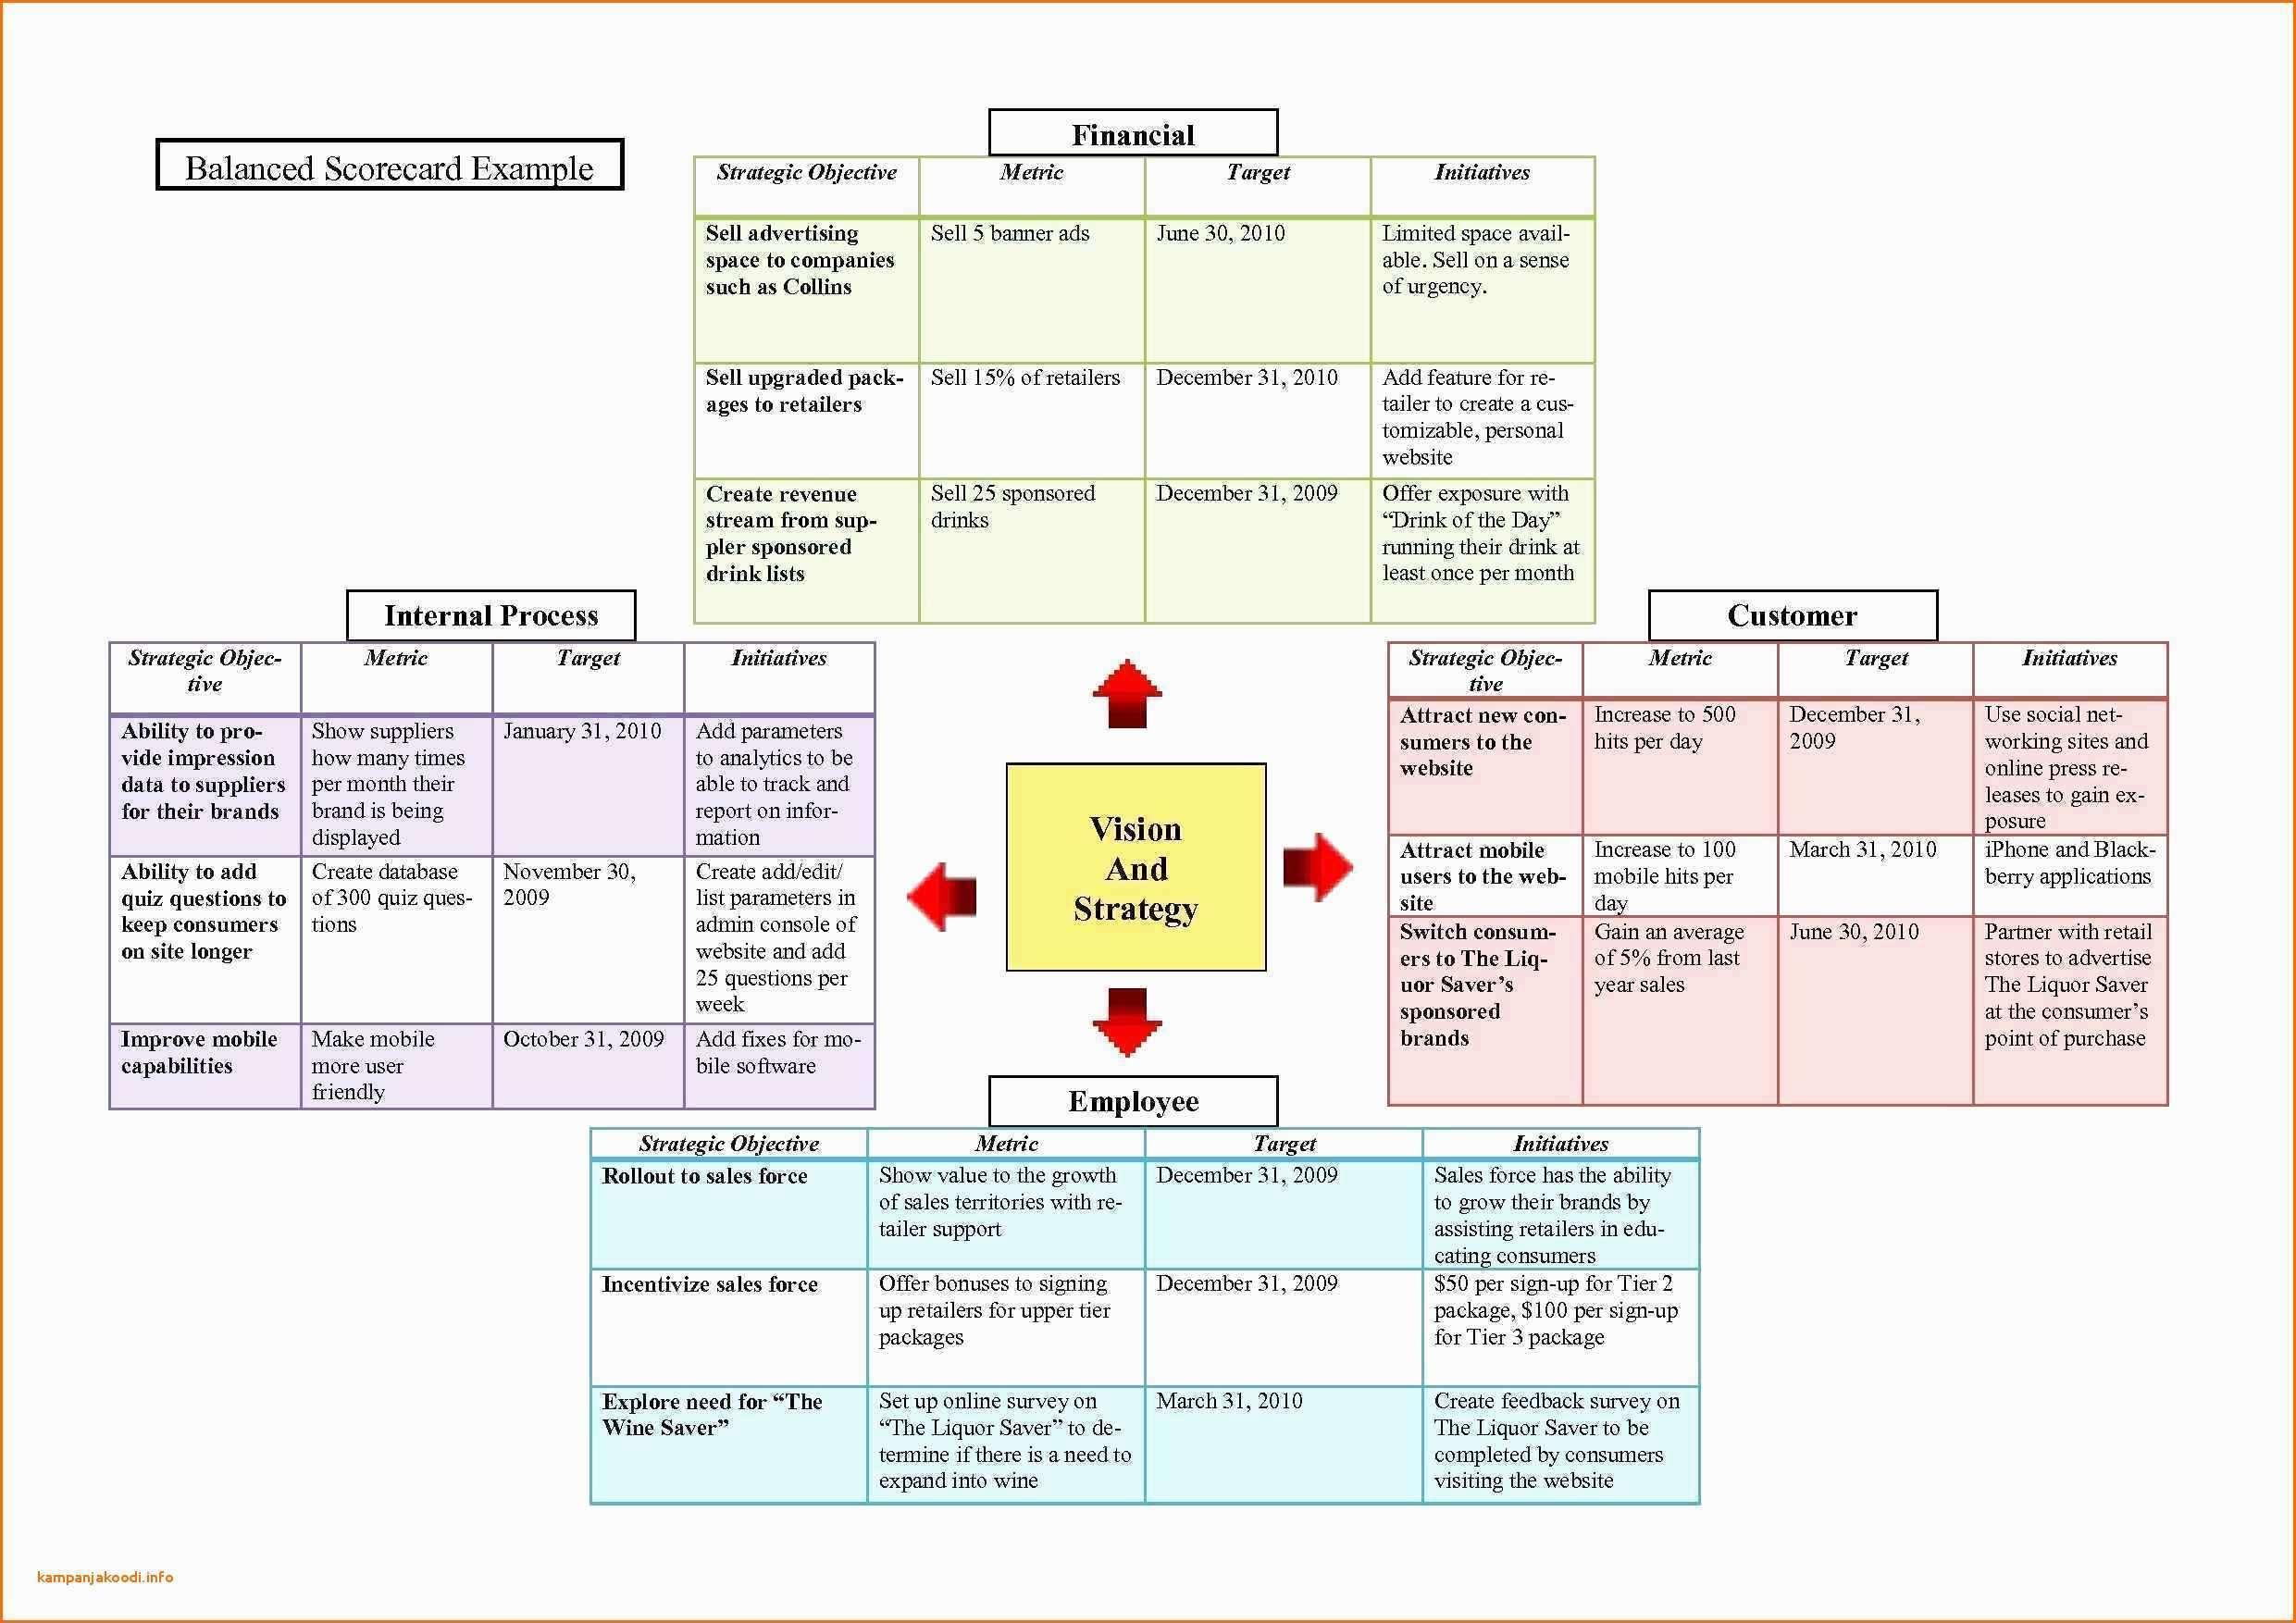 Free Free Balanced Scorecard Template Excel With Free Balanced Scorecard Template Excel In Spreadsheet